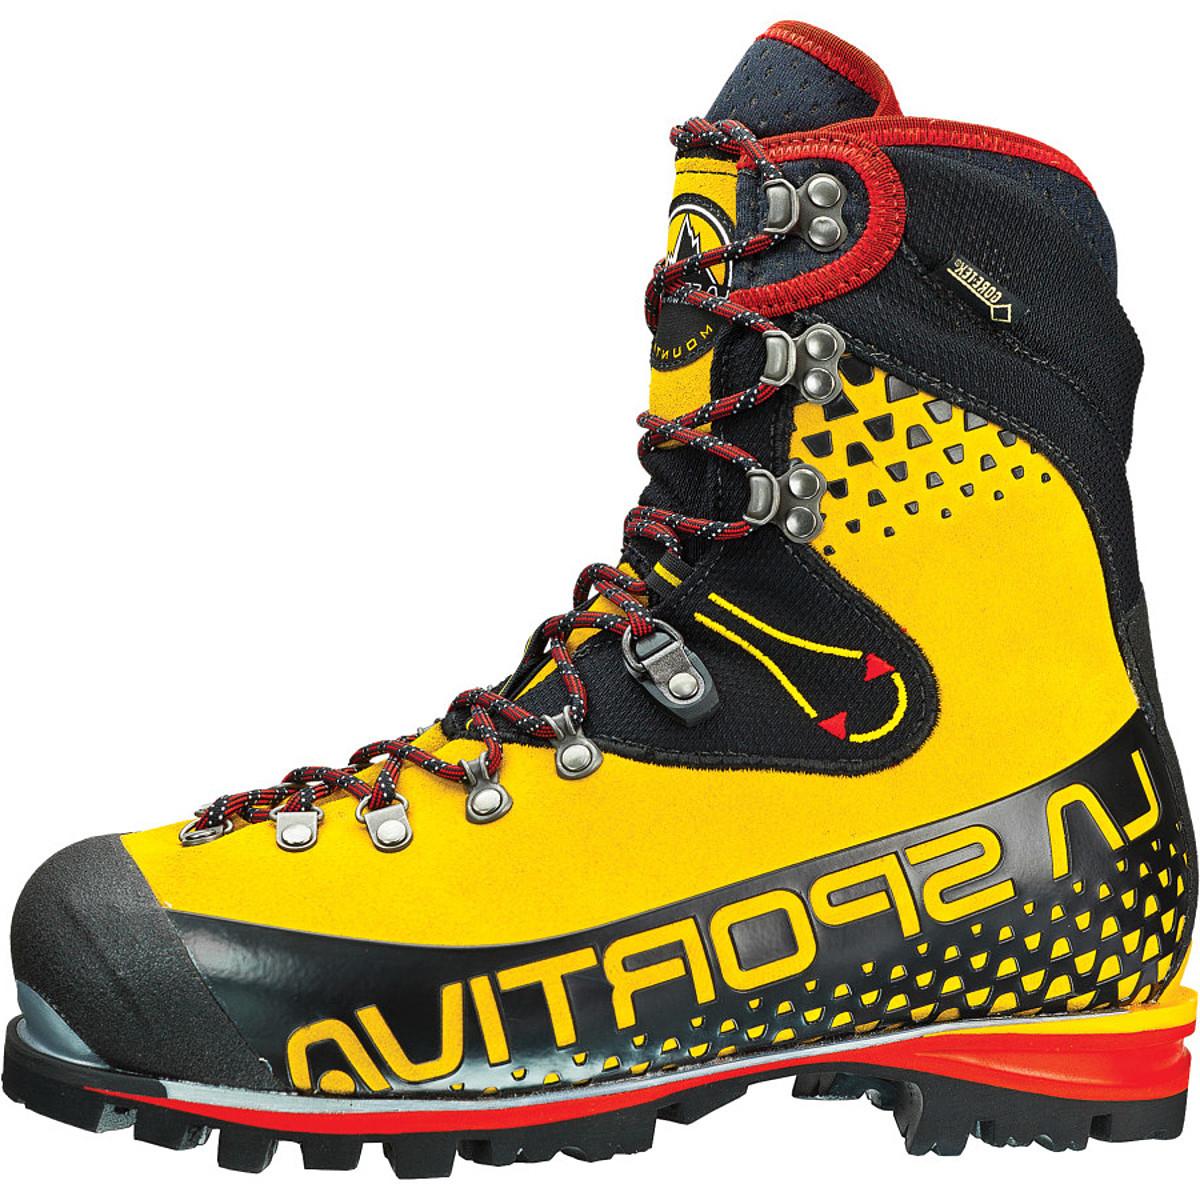 La Sportiva Nepal Cube GTX Mountaineering Boot - Men's